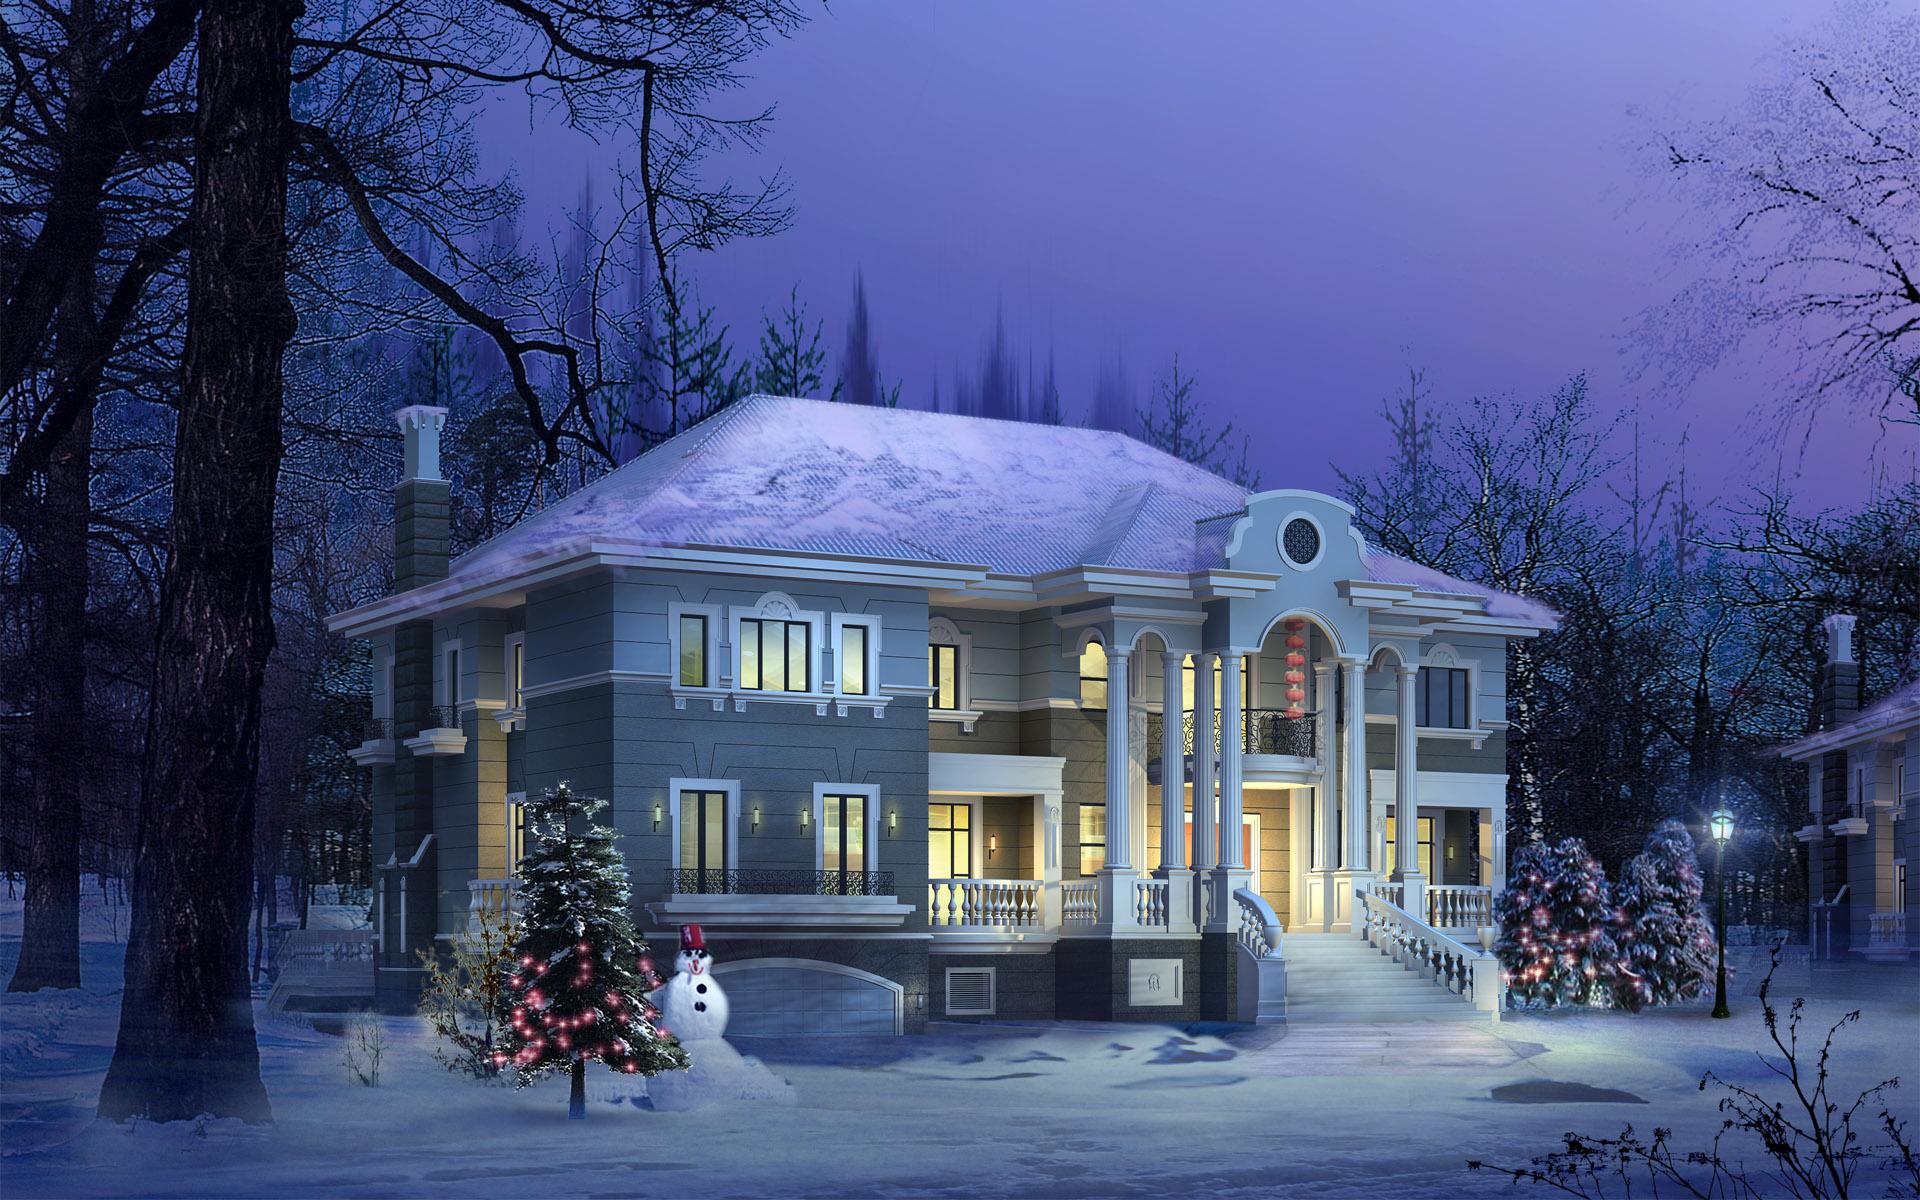 Winter Wallpapers: 35 Beautiful Winter Wallpapers: themeshut.blogspot.com/2010/11/winter-wallpapers.html